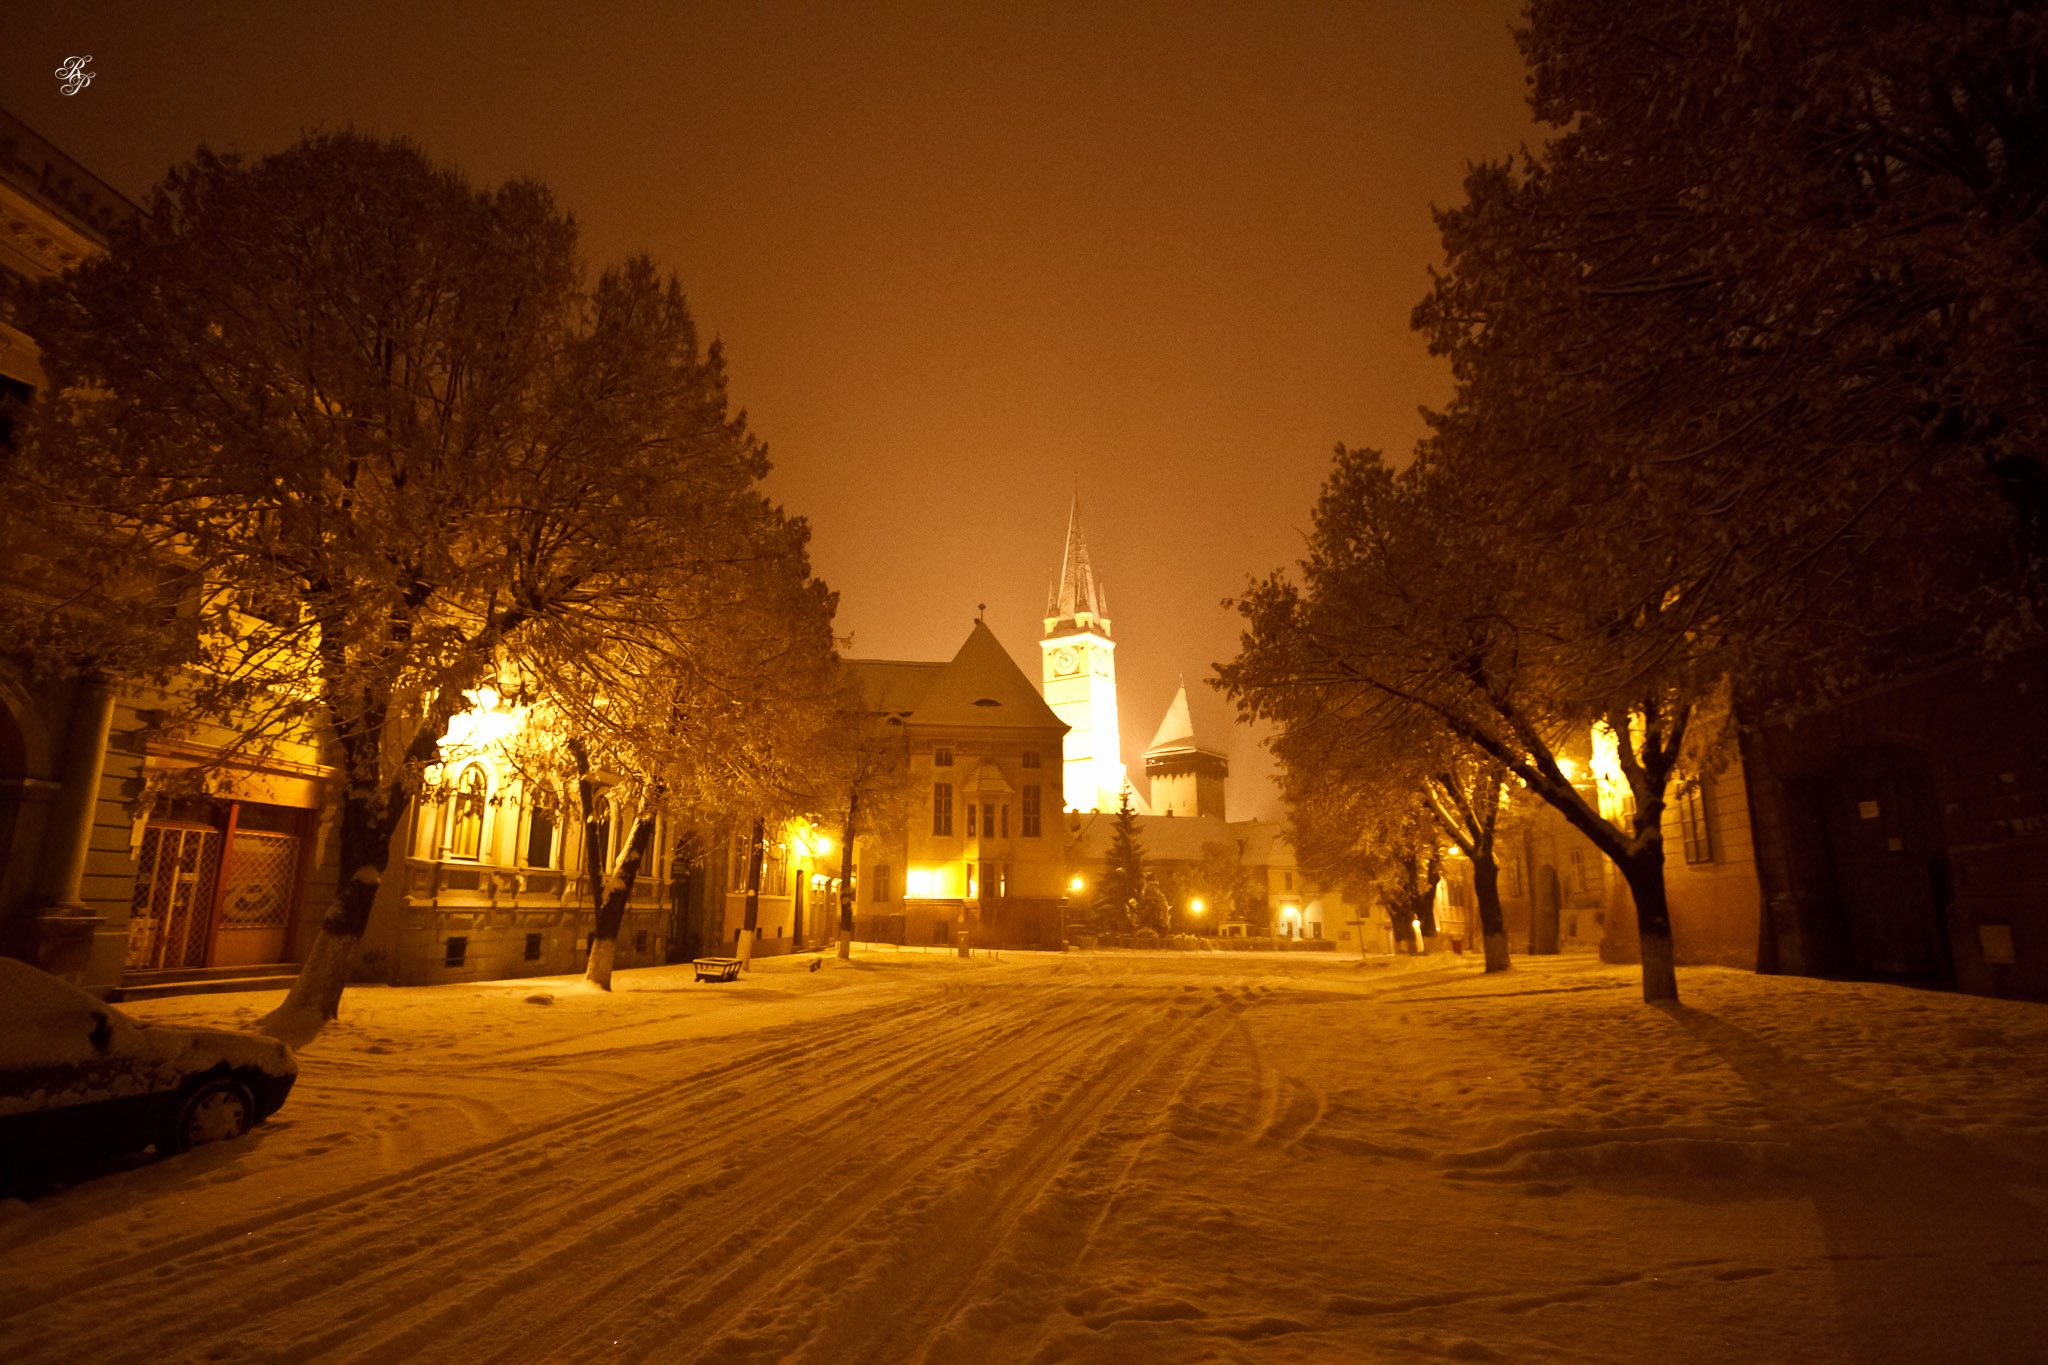 a snowy evening walk in medias raoul pop